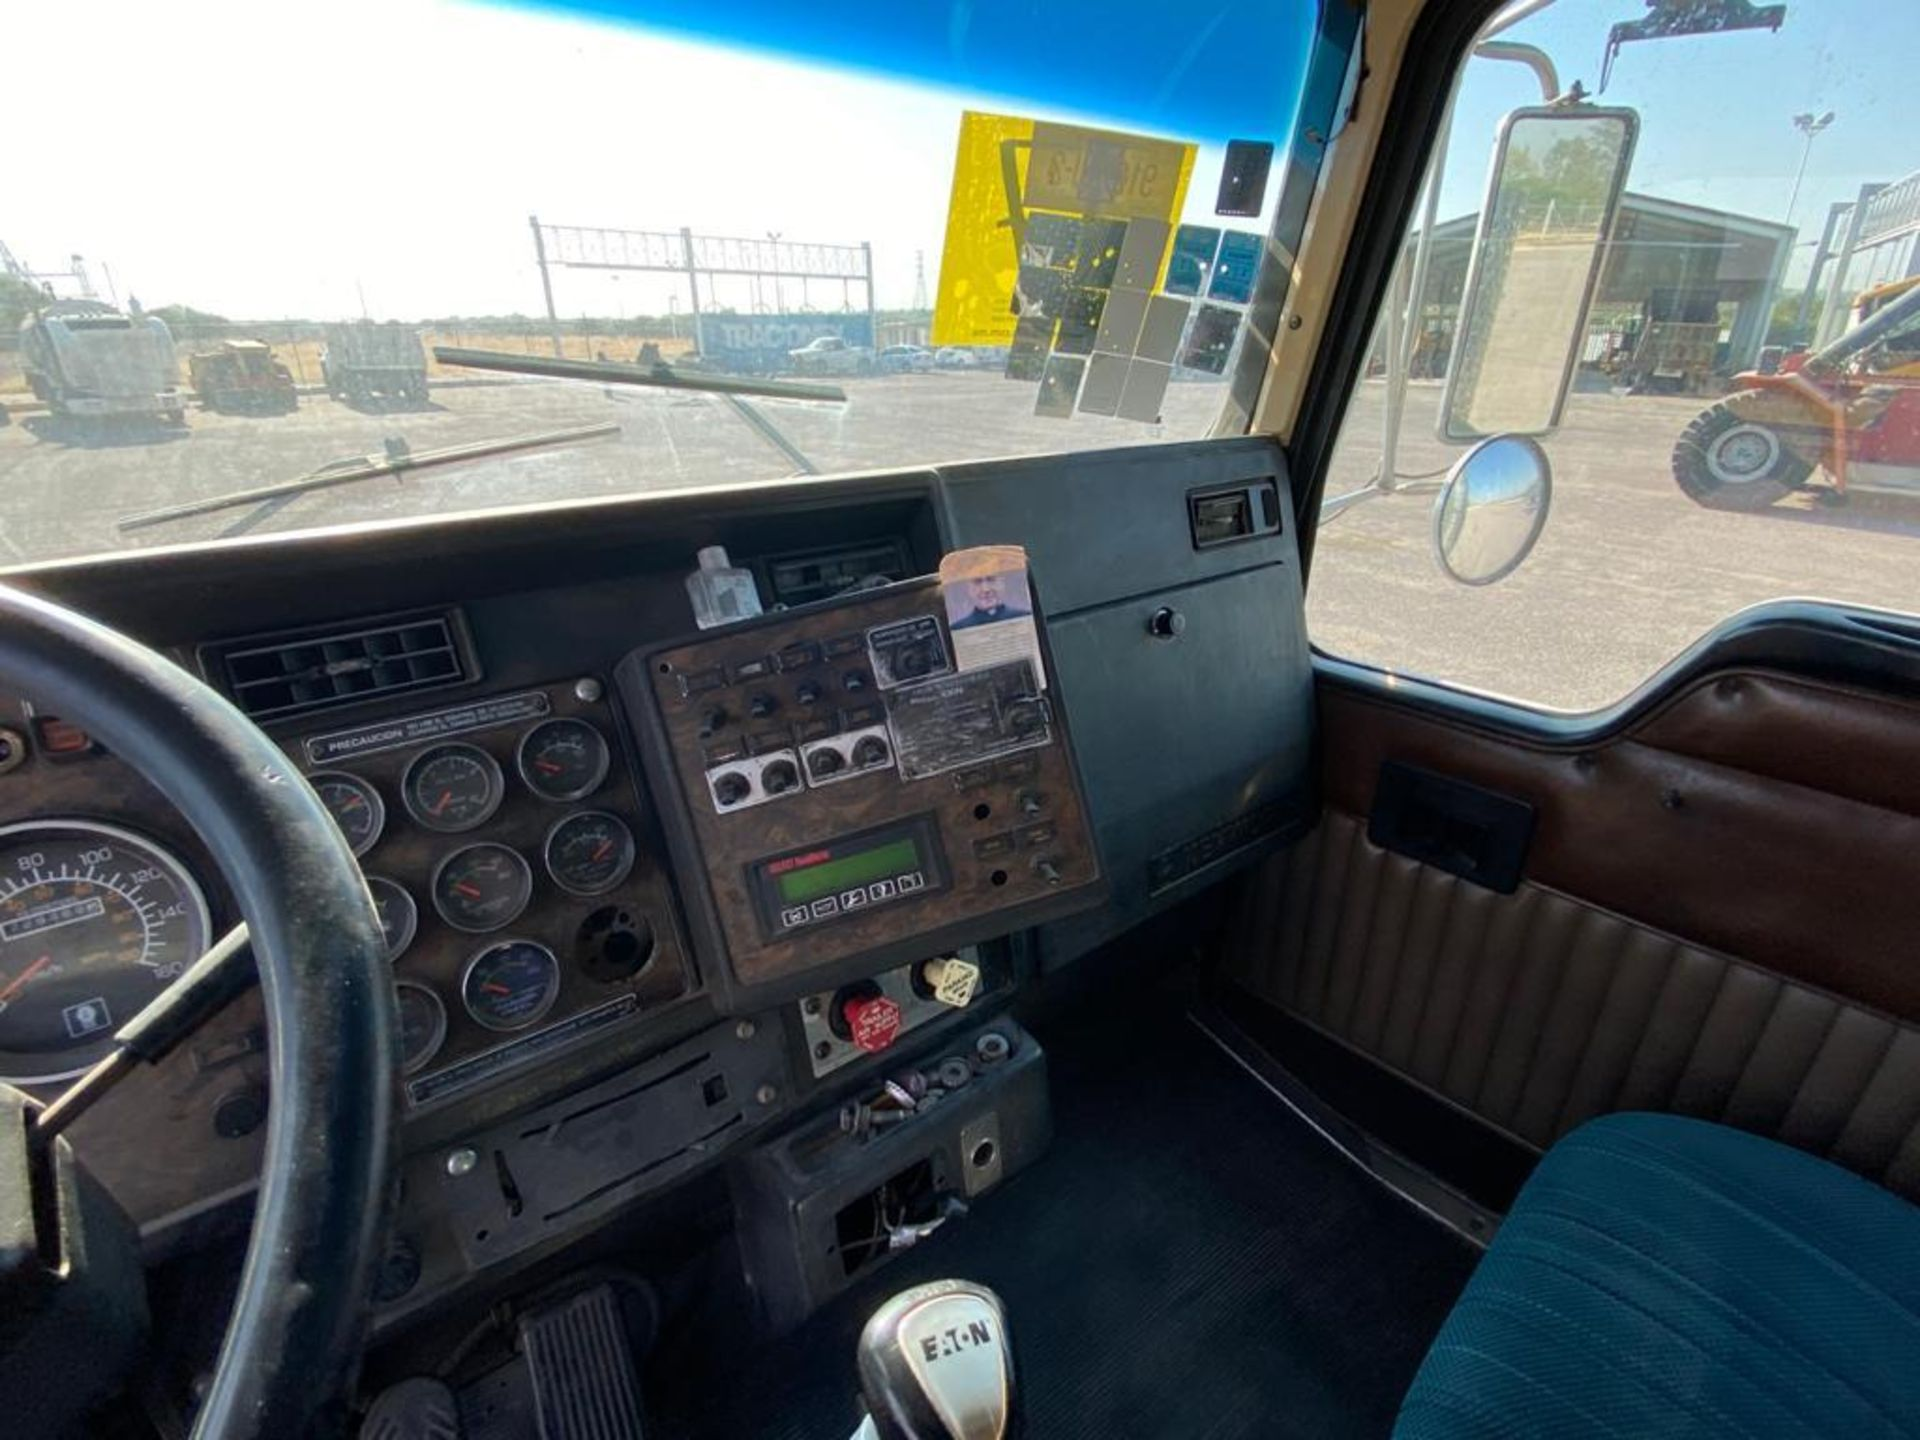 1998 Kenworth Sleeper Truck Tractor, standard transmission of 18 speeds - Image 30 of 55